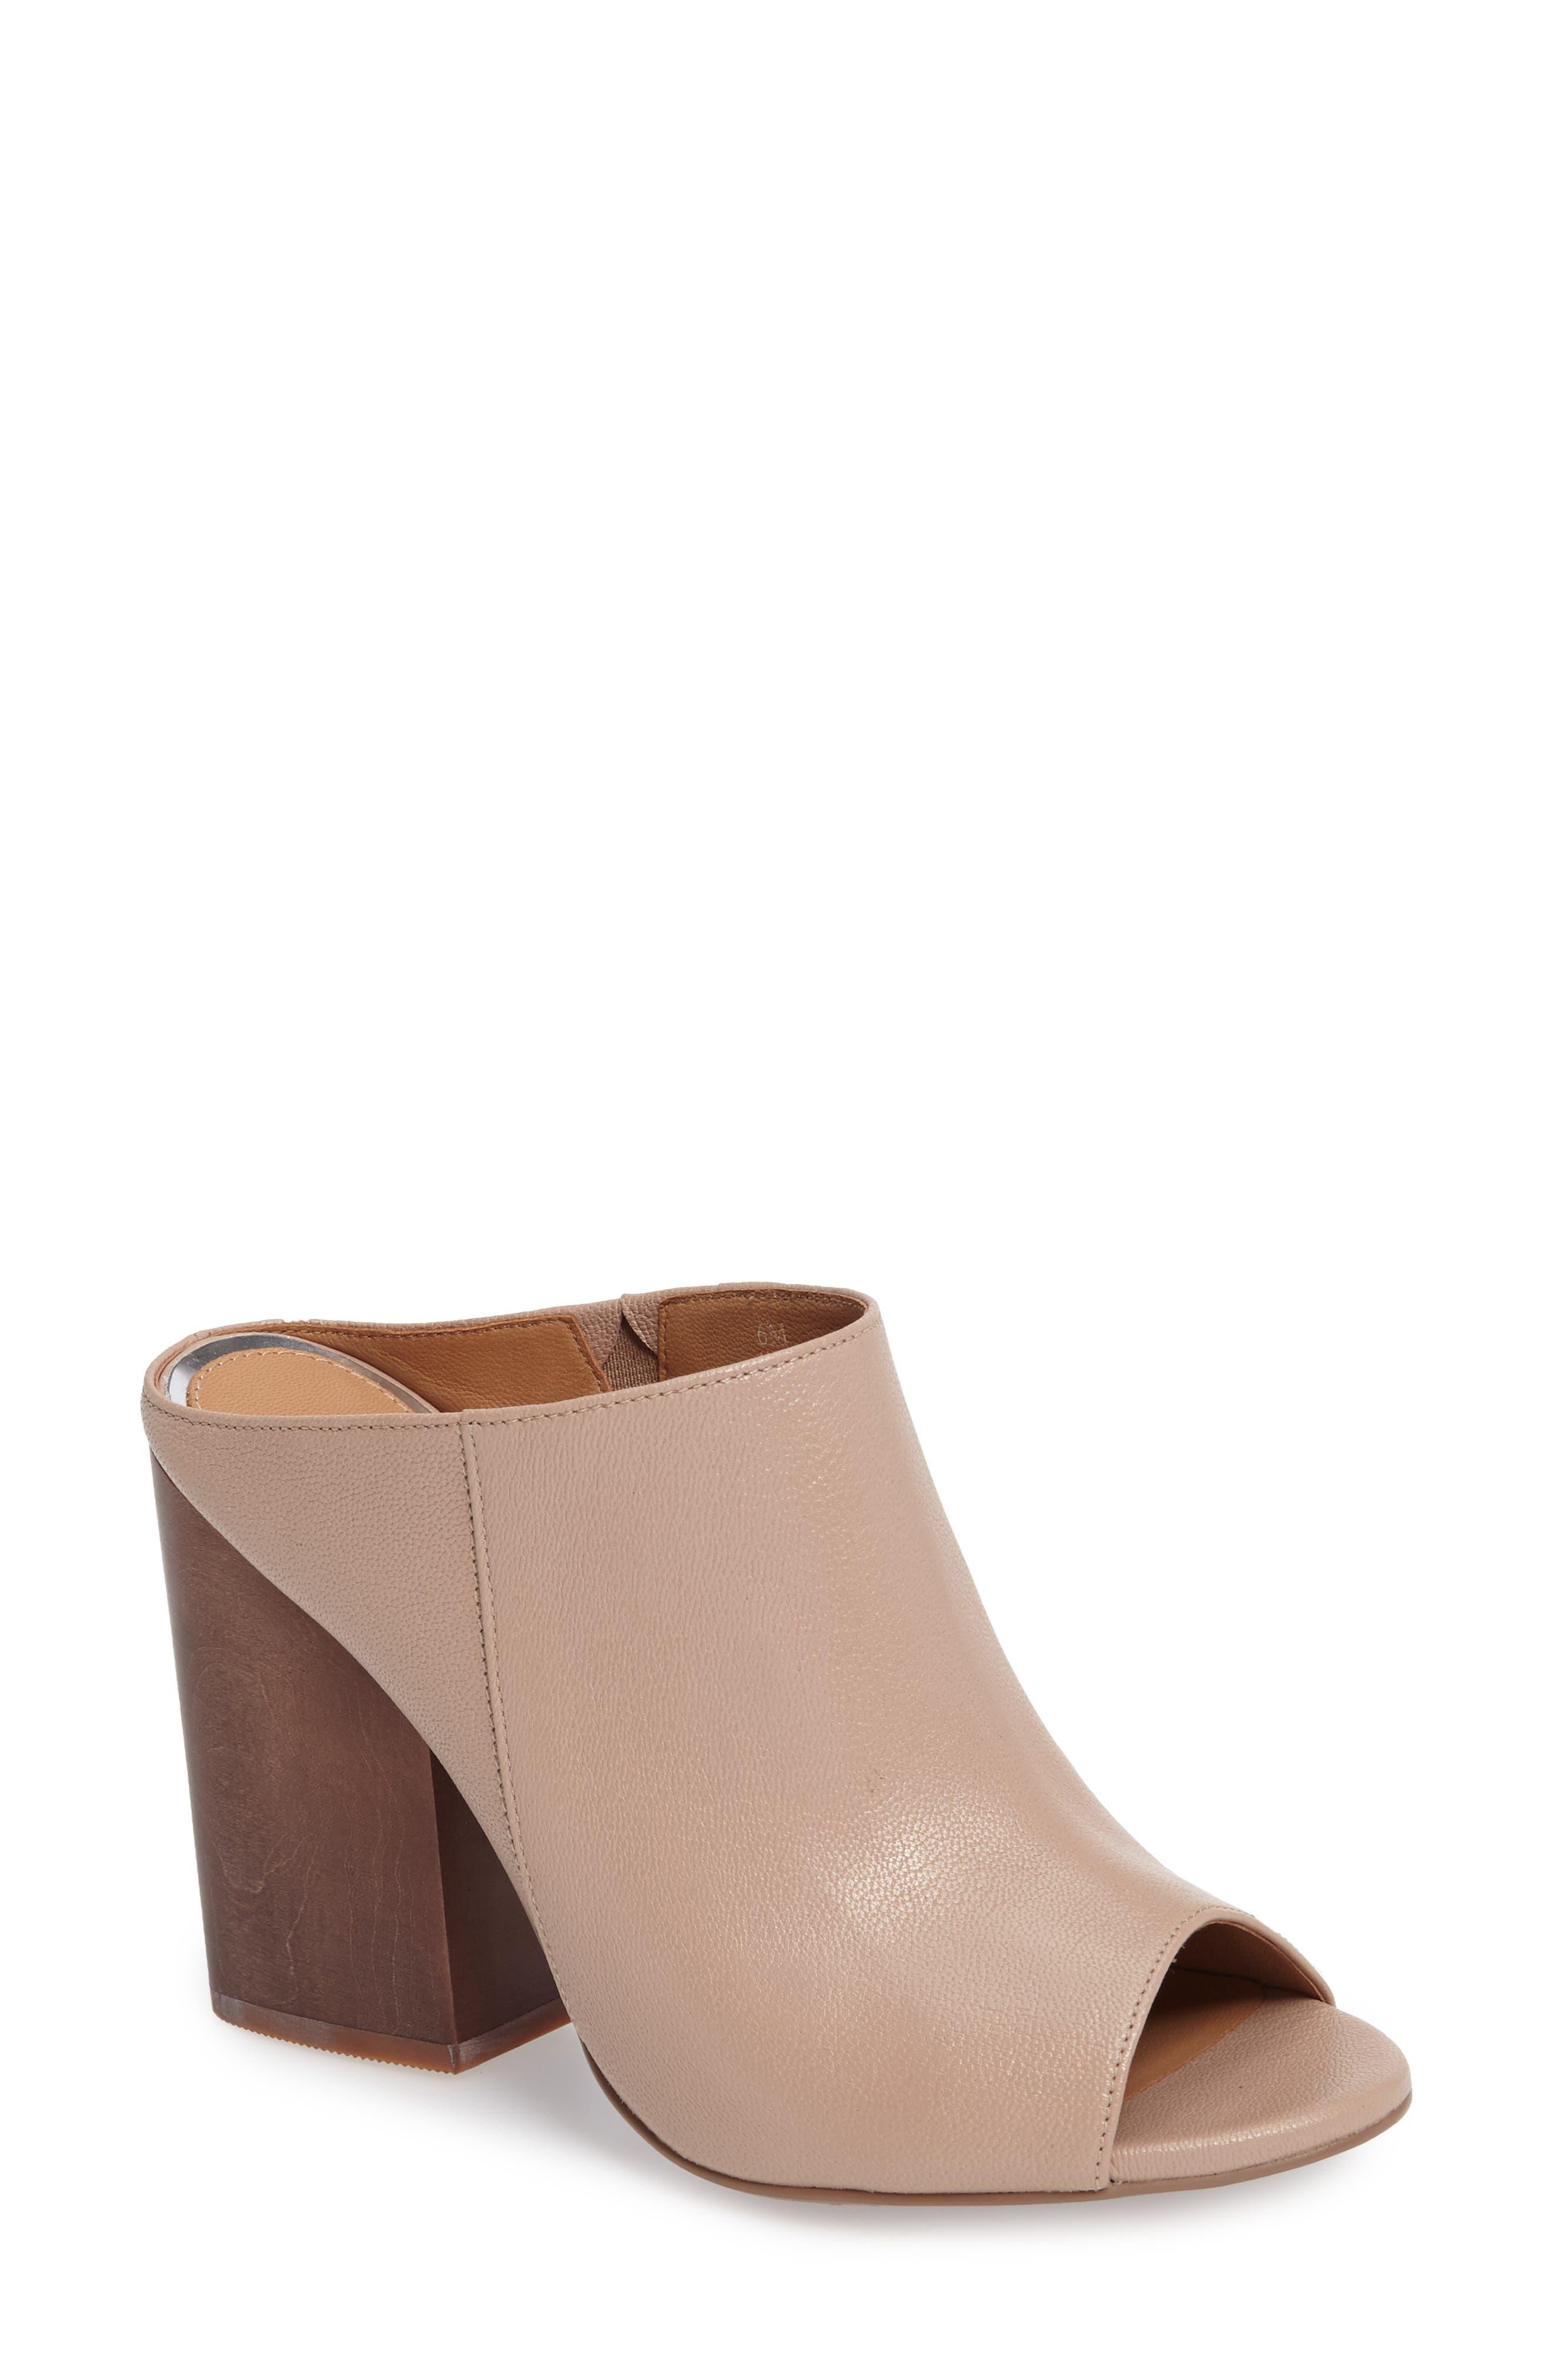 Gabby Block Heel Mule,                         Main,                         color, Blush Leather